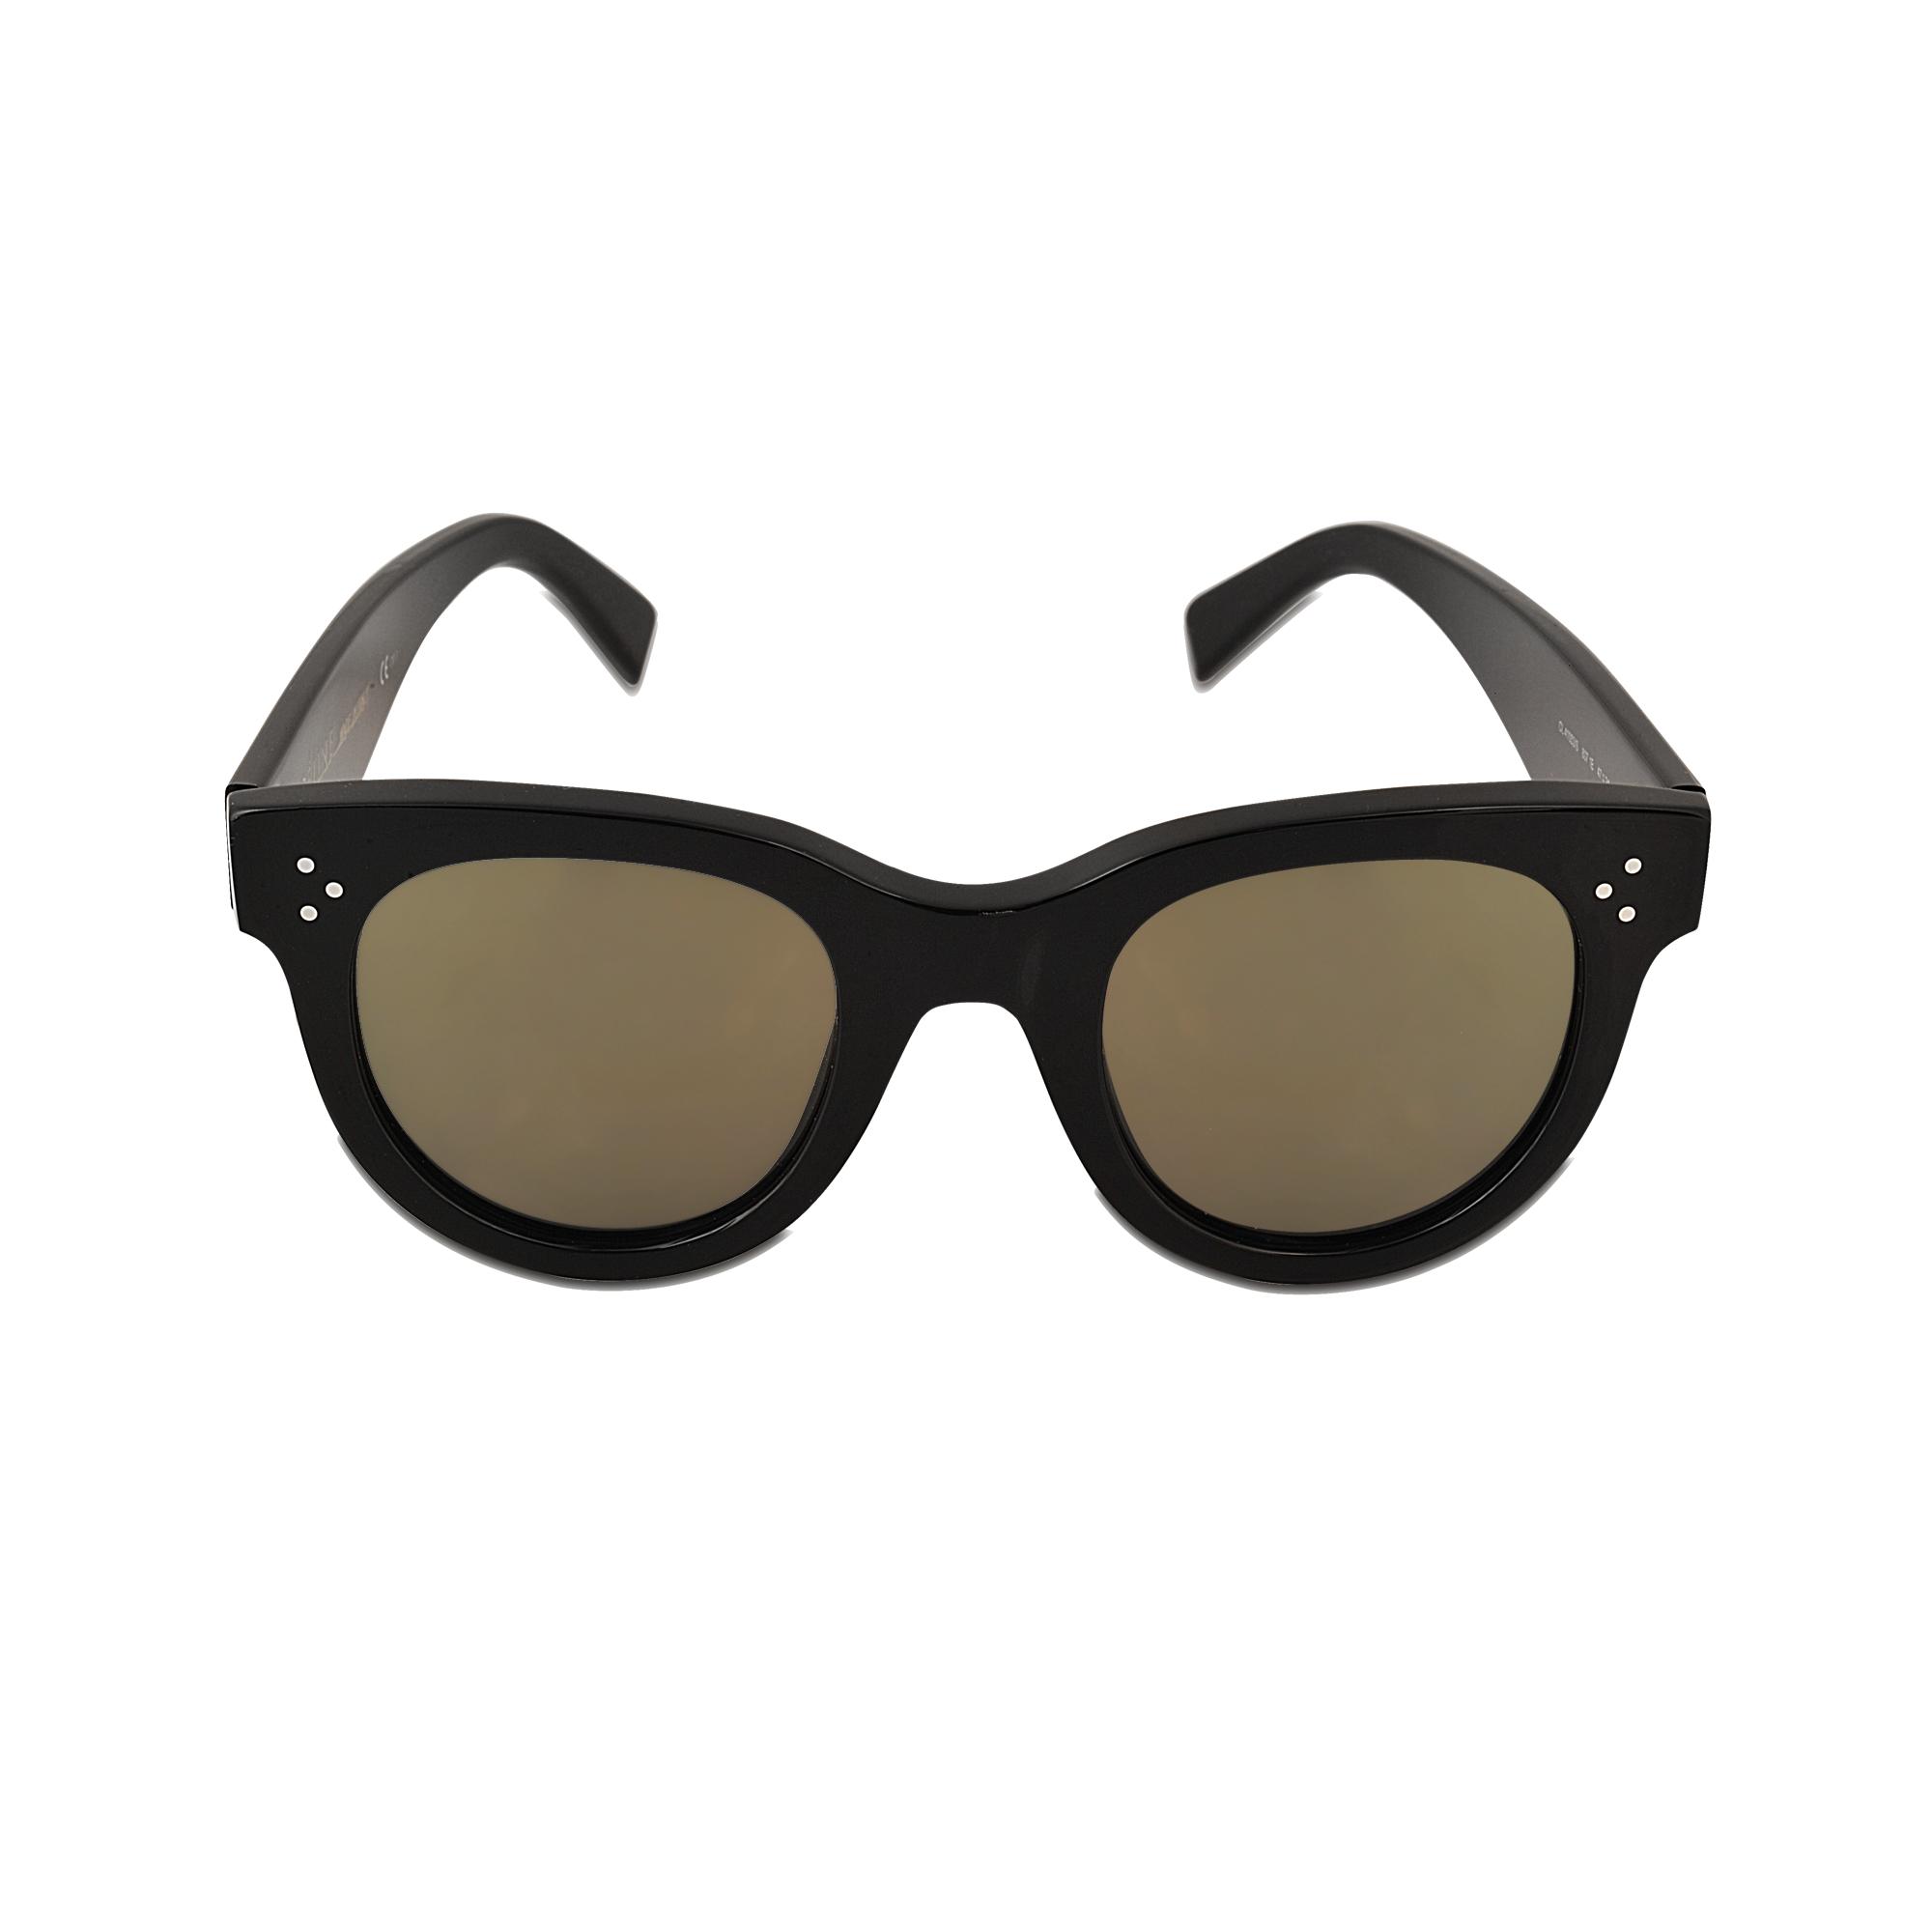 c2b7f16749 Celine Baby Audrey Black Sunglasses - Bitterroot Public Library